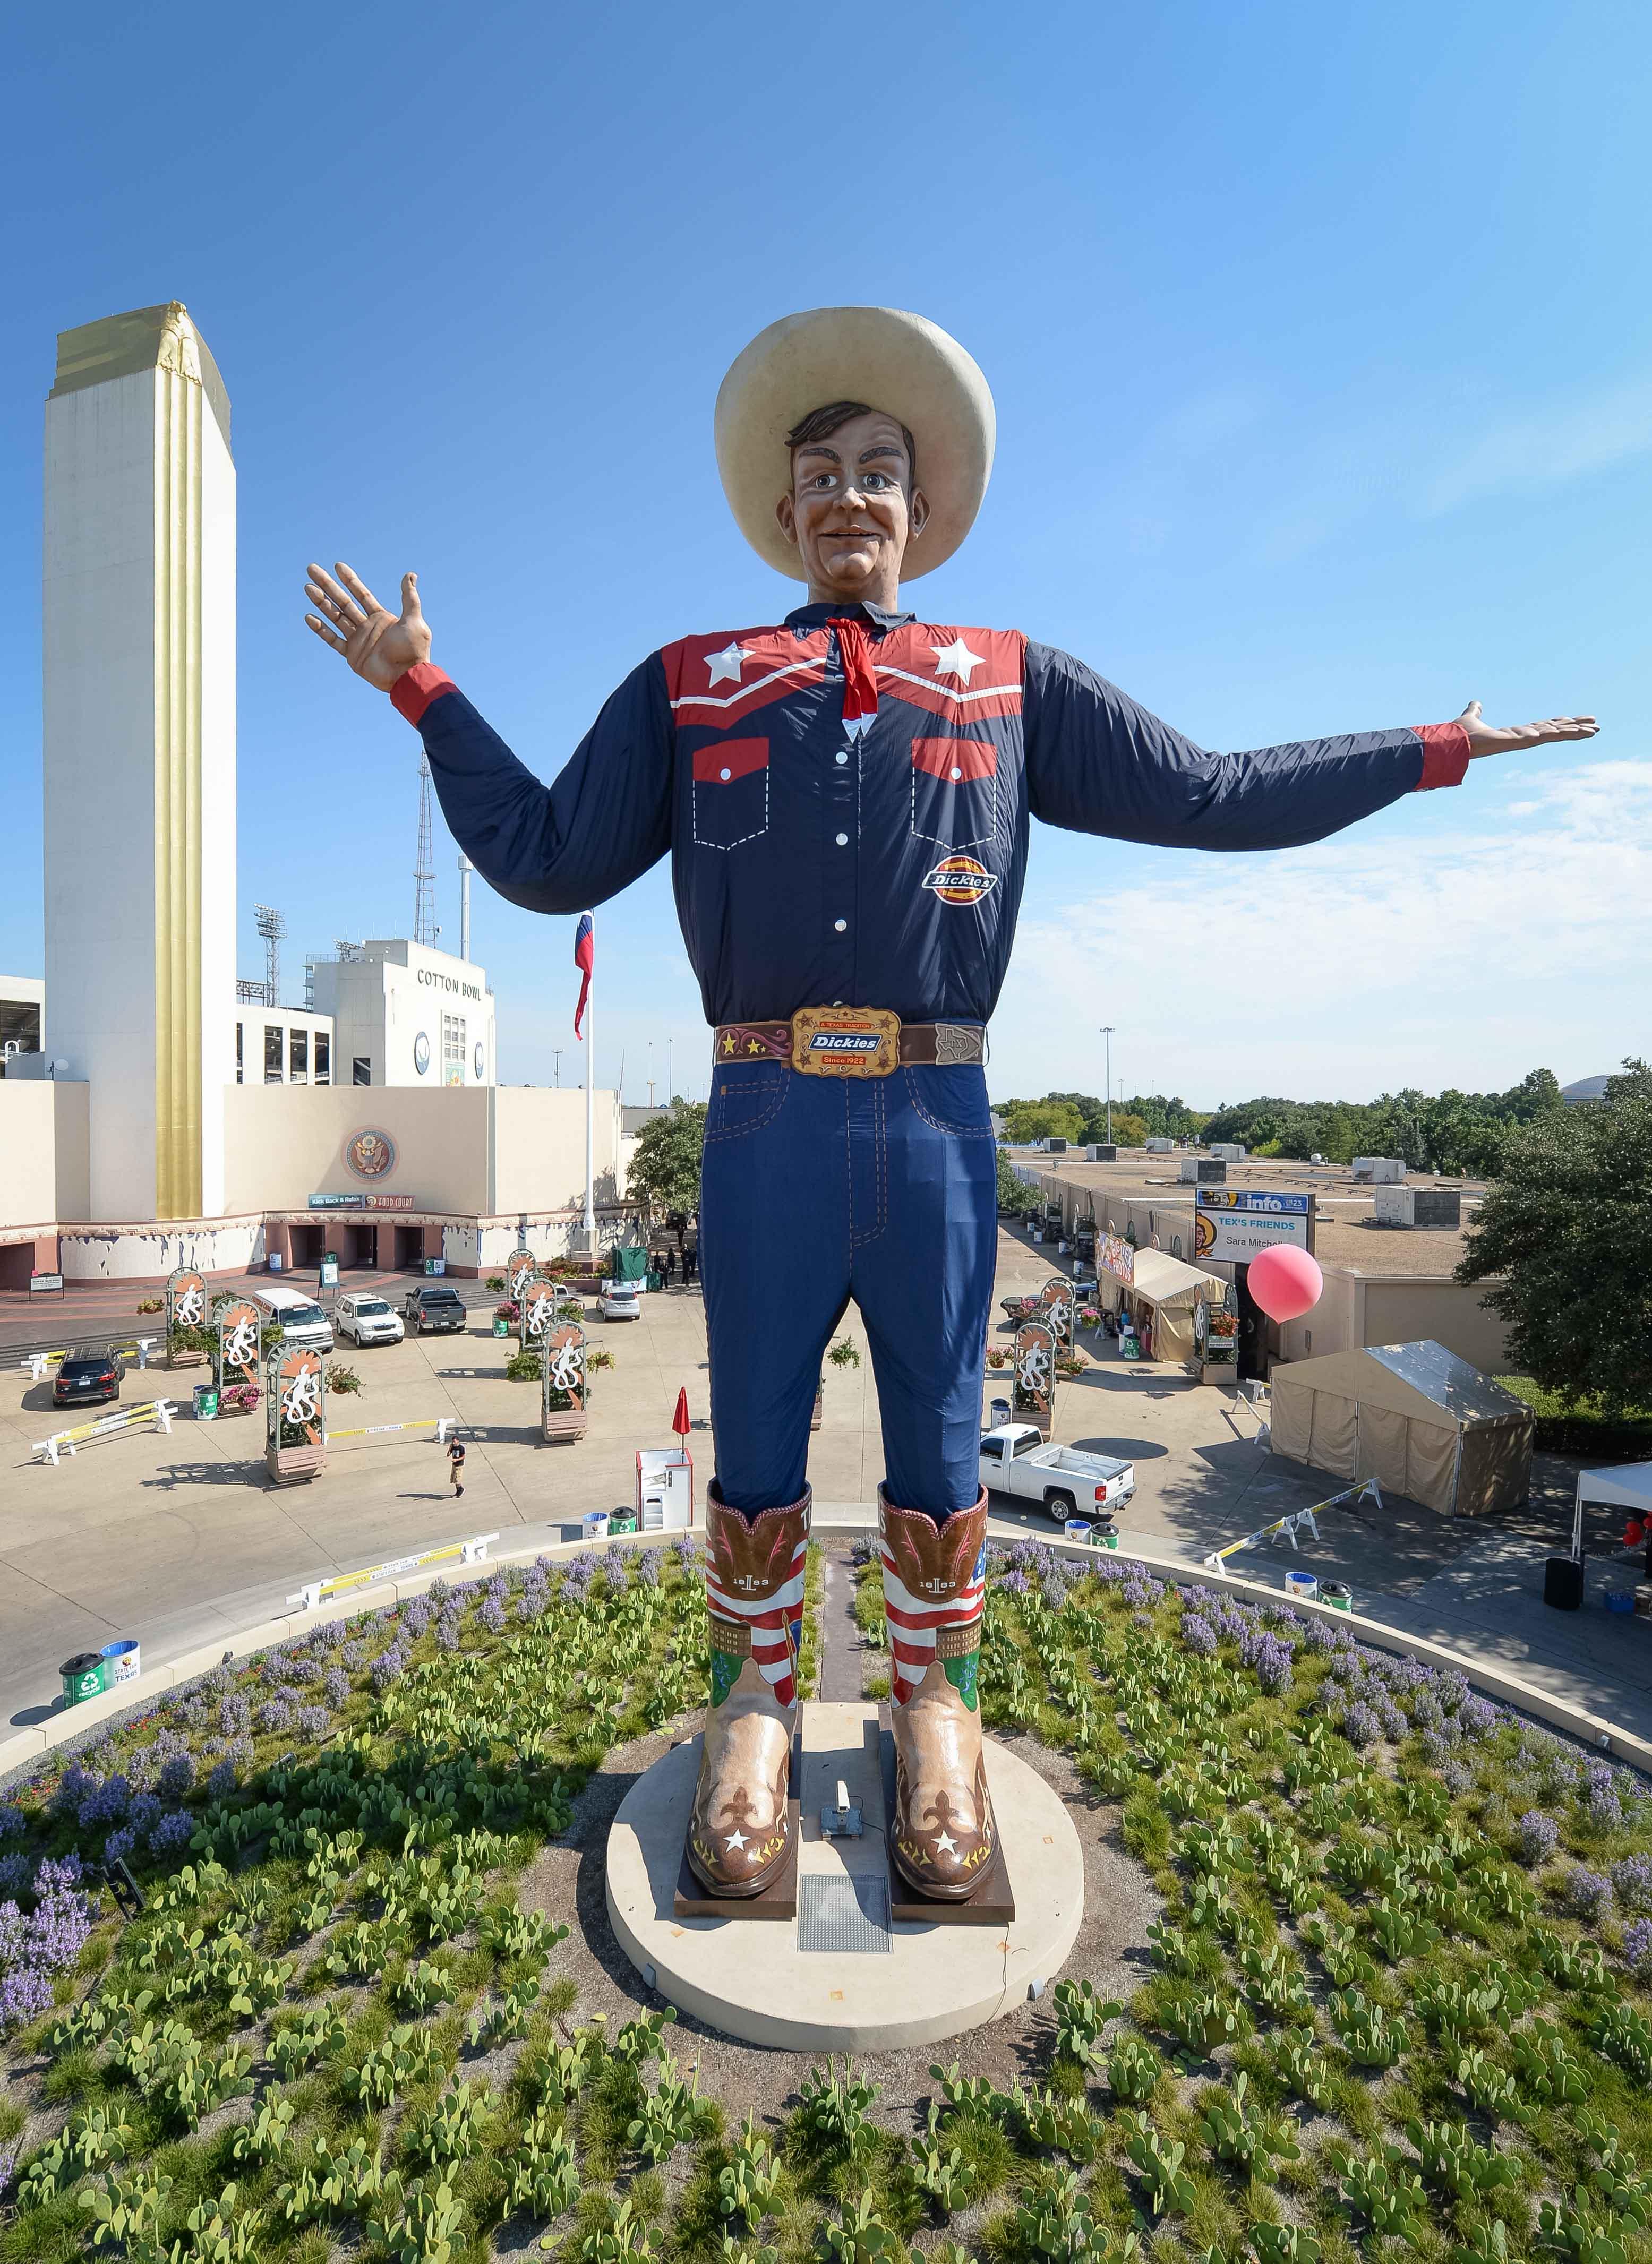 State fair of texas 2015 dates